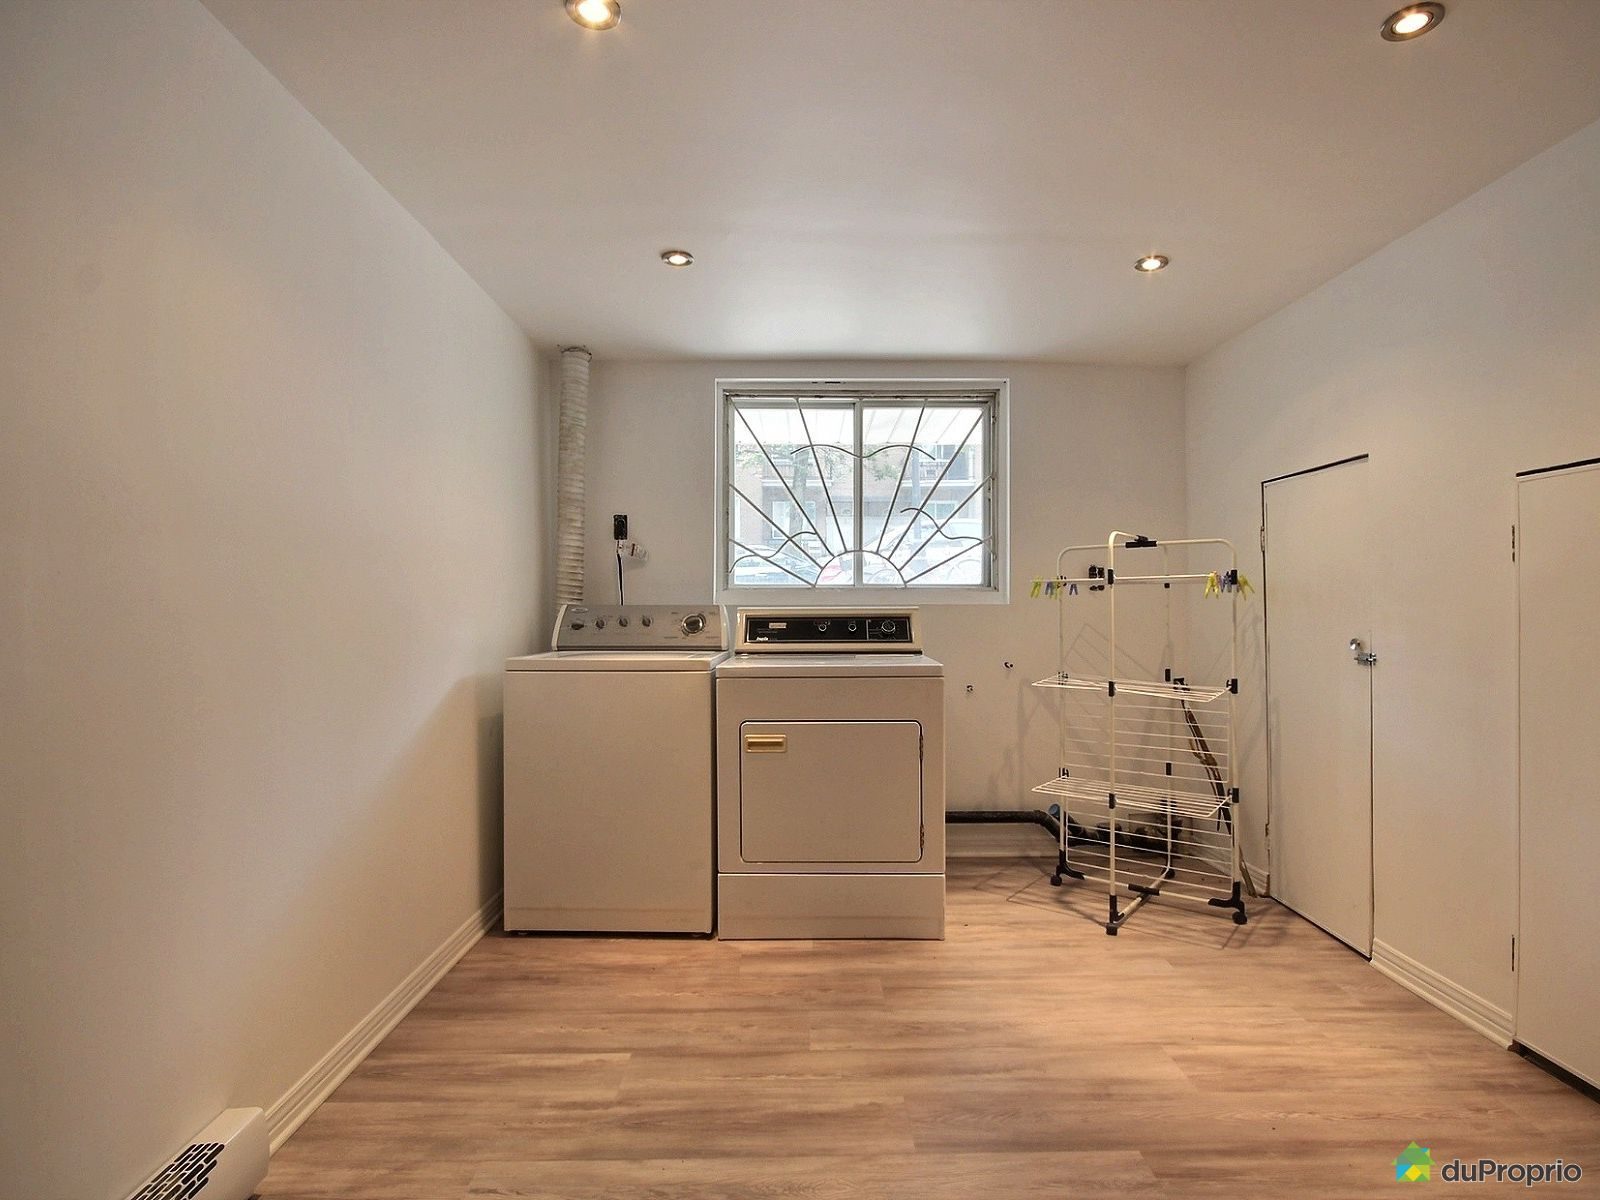 duplex vendre montr al 2725 rue cuvillier immobilier qu bec duproprio 712801. Black Bedroom Furniture Sets. Home Design Ideas